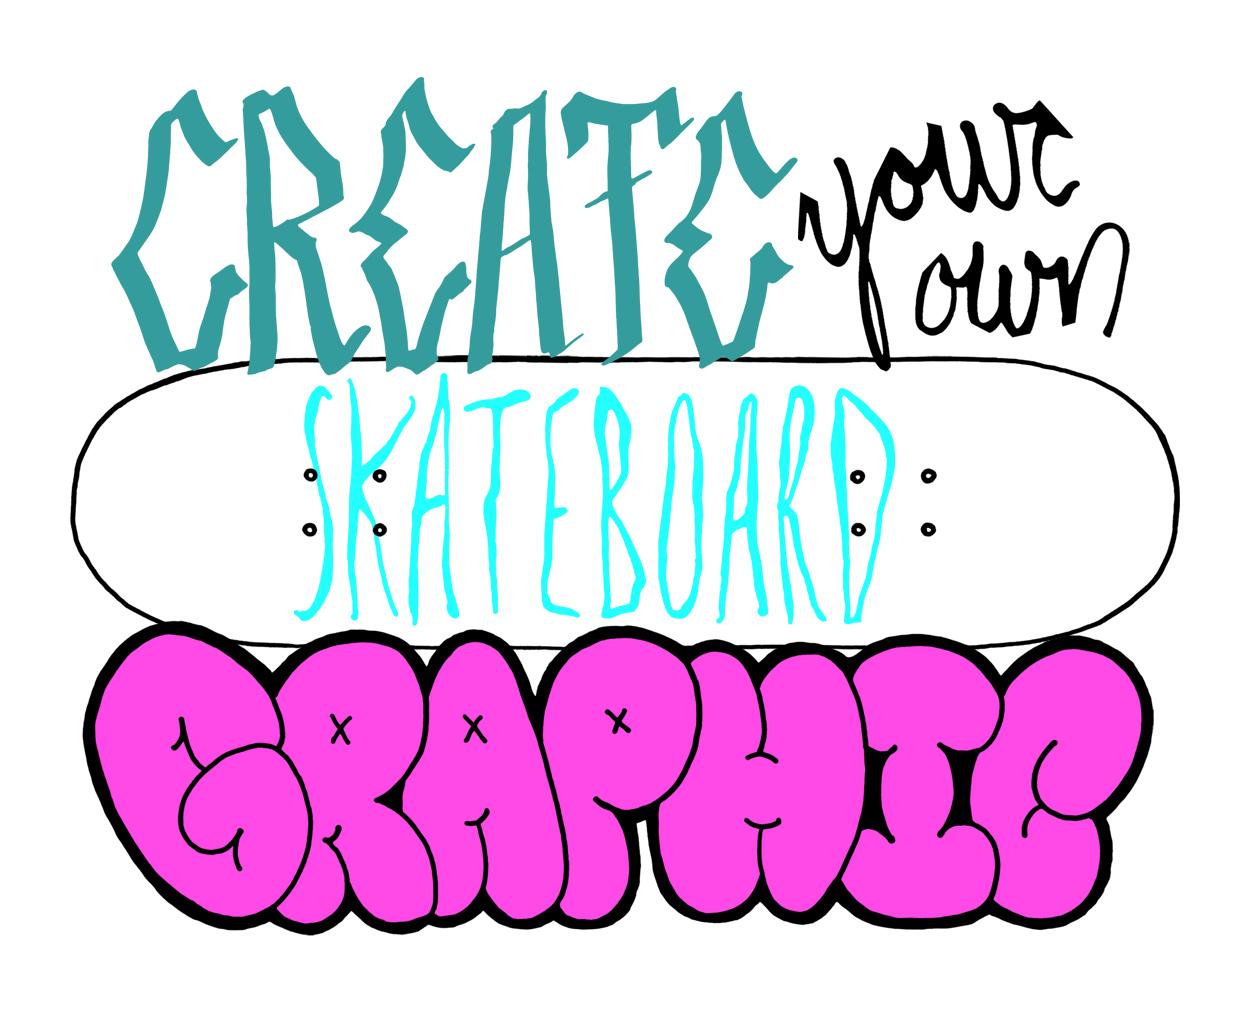 create_your_own_vector_me.jpg